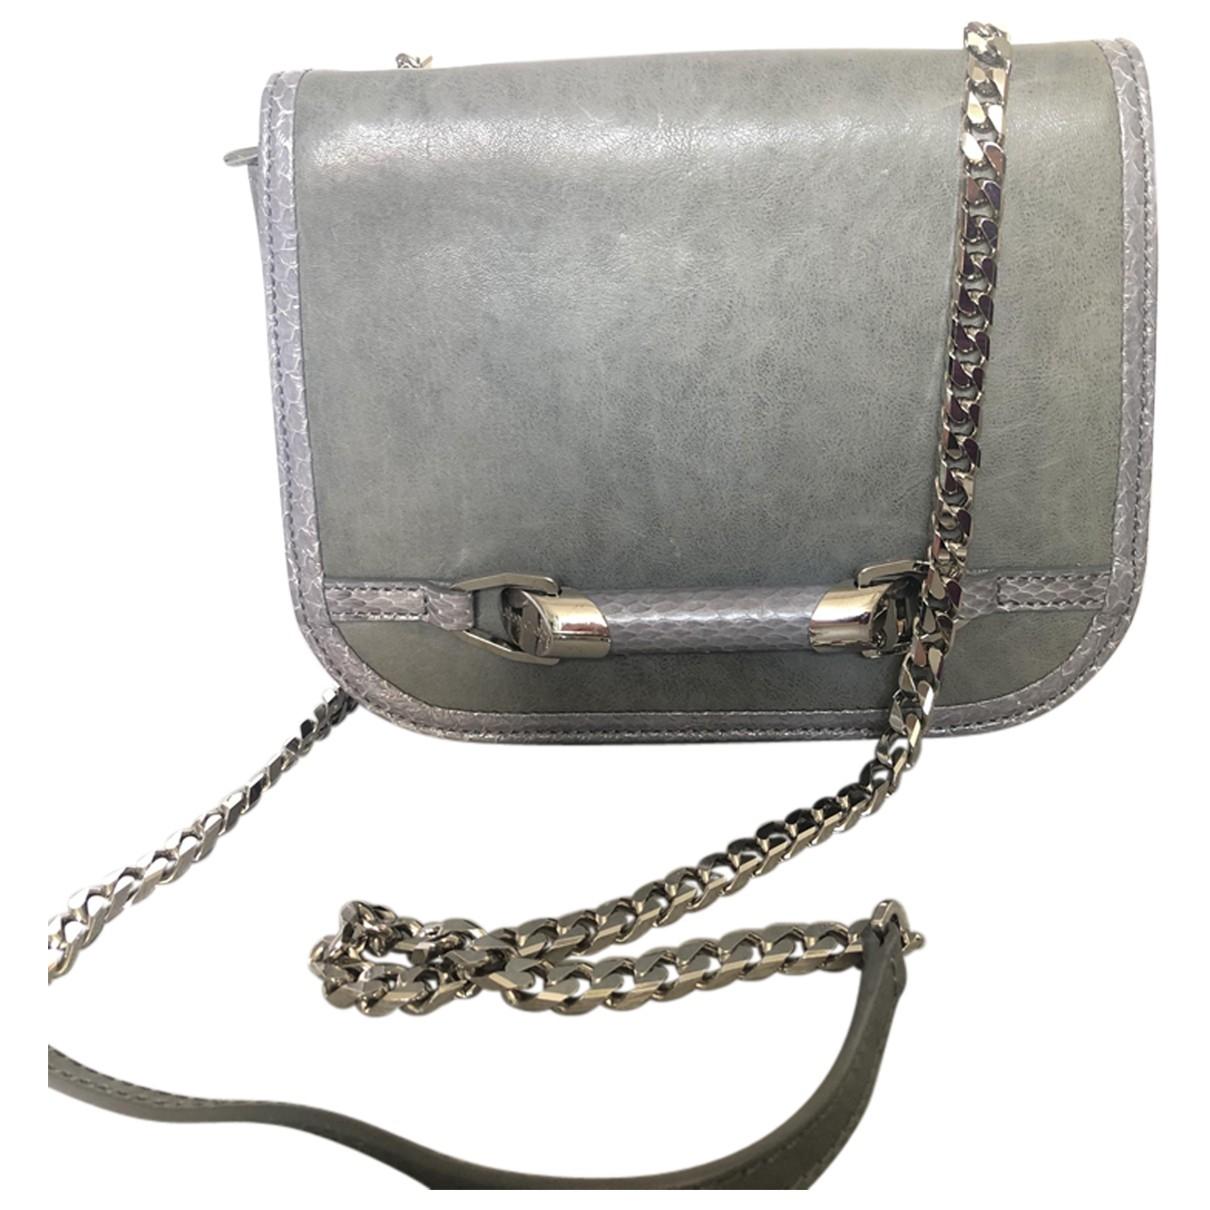 Jimmy Choo \N Grey Leather Clutch bag for Women \N